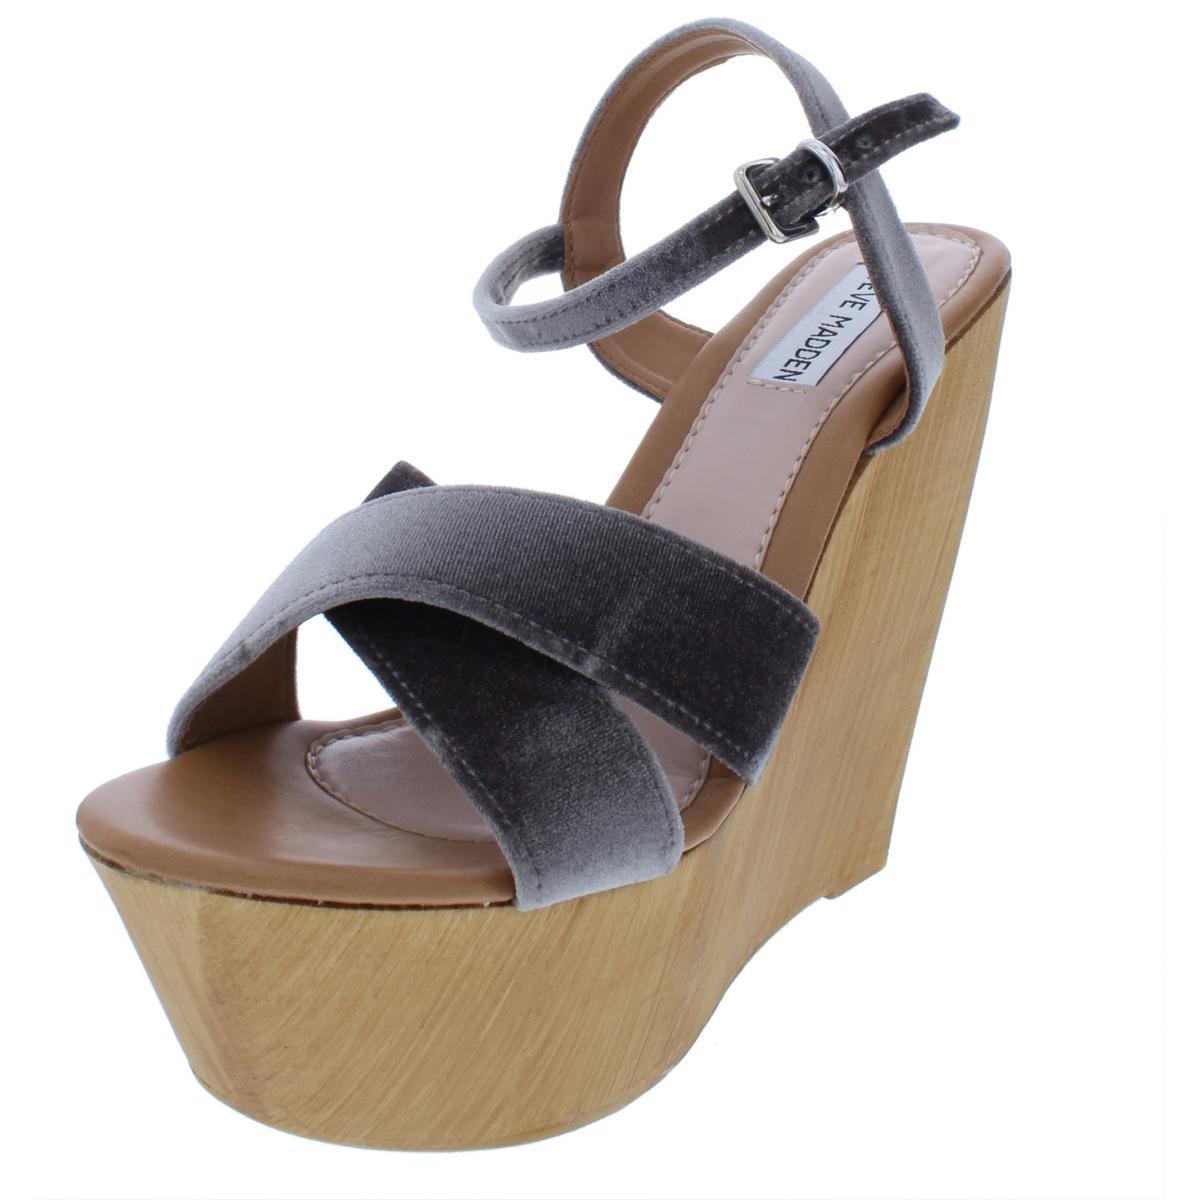 4e692f764bf Details about Steve Madden Womens Brittany Black Velvet Wedges Shoes 9  Medium (B,M) BHFO 1965